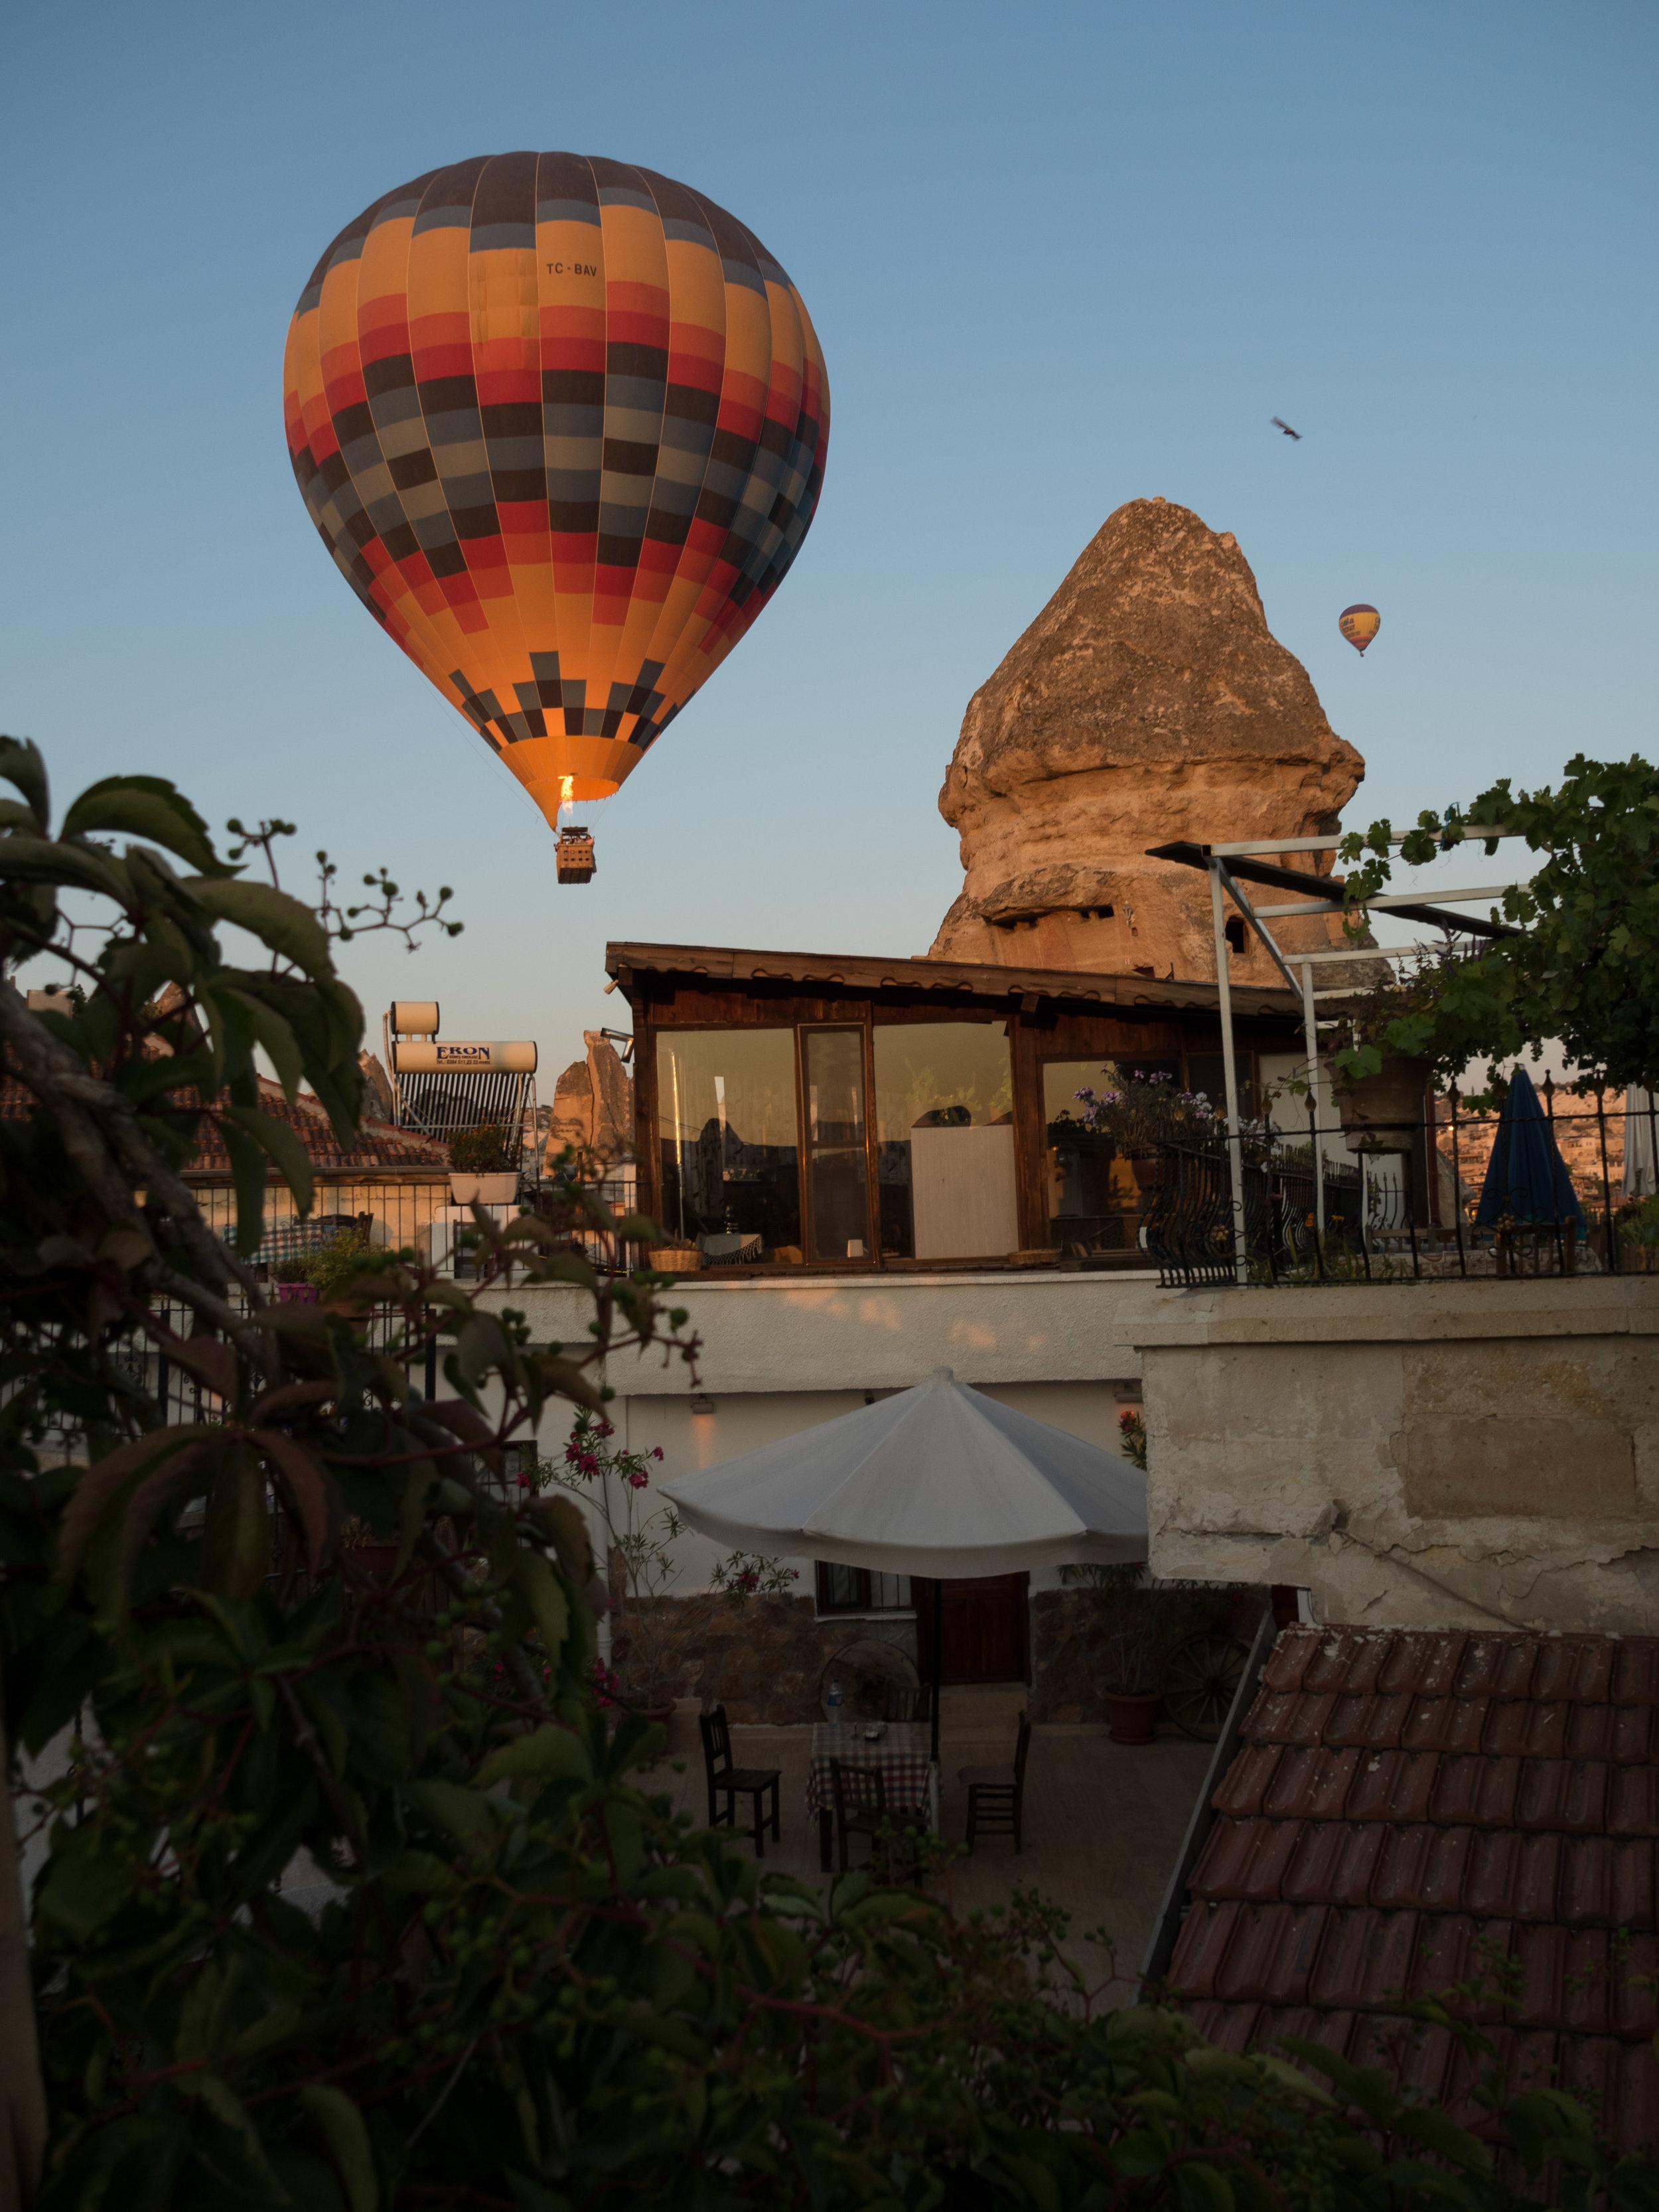 Balloon & Chimney